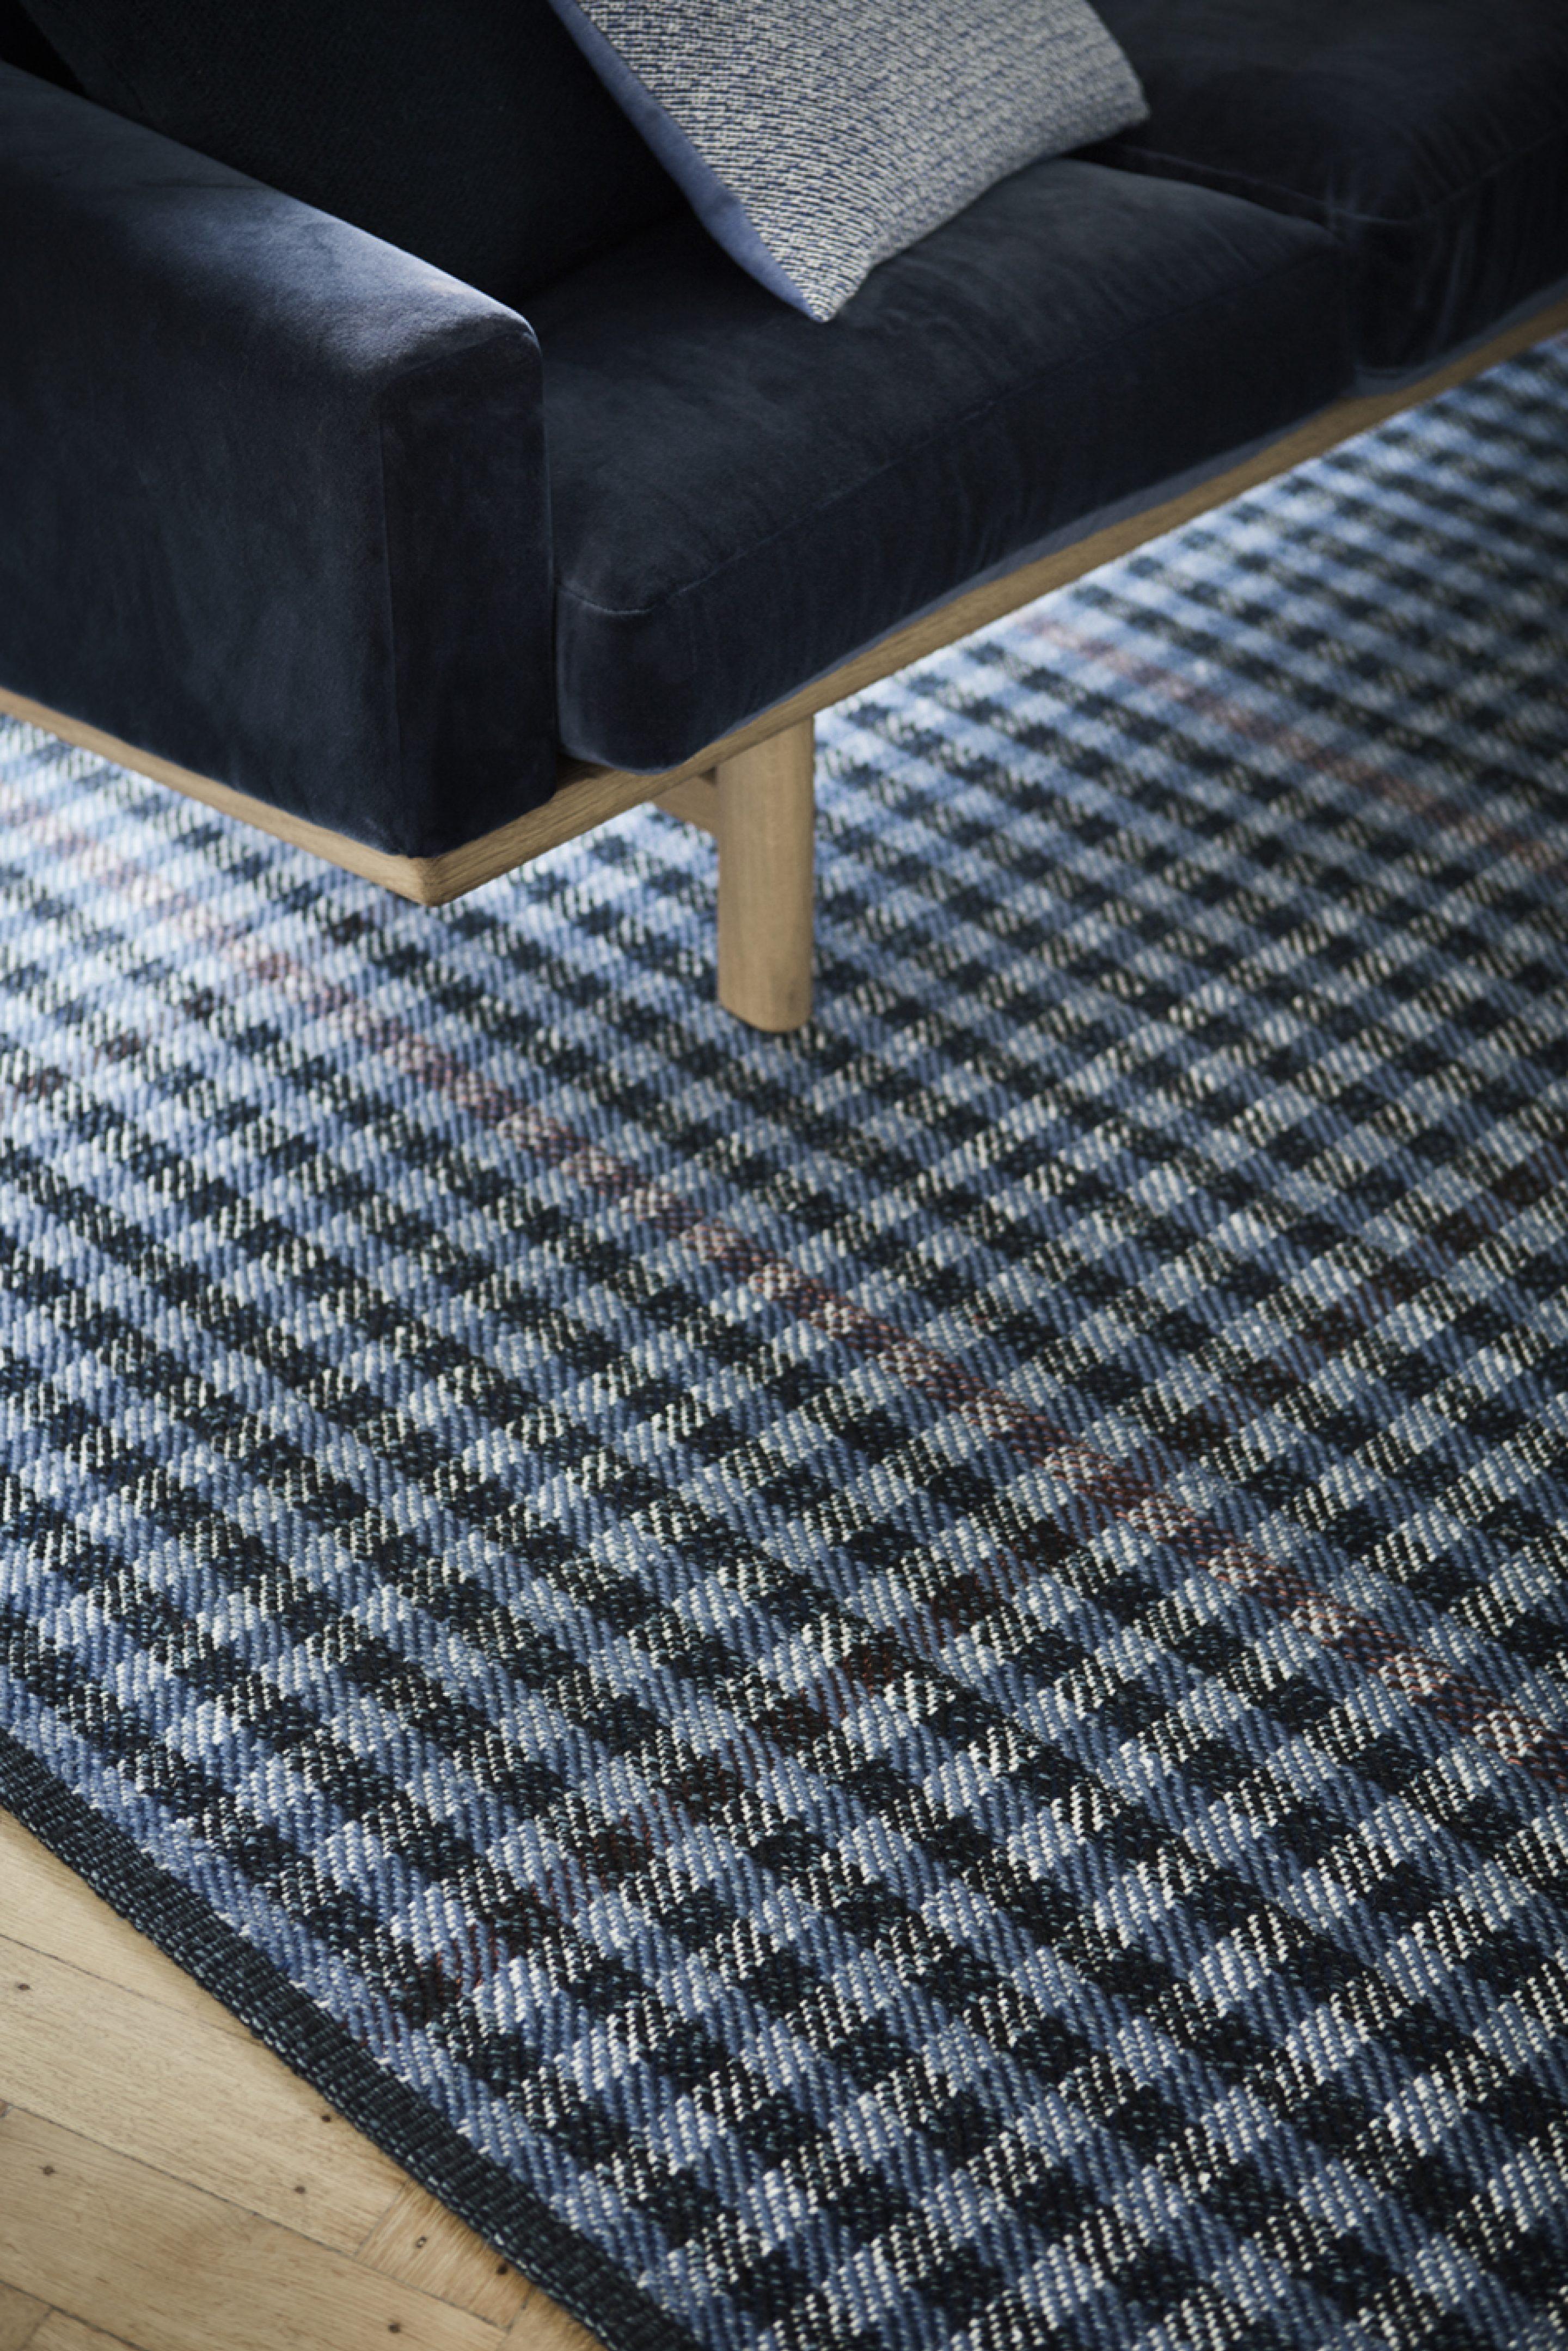 Fabula Lotus Rug Blue Mahogany Wool Hand Woven 1742  A2 72Dpi